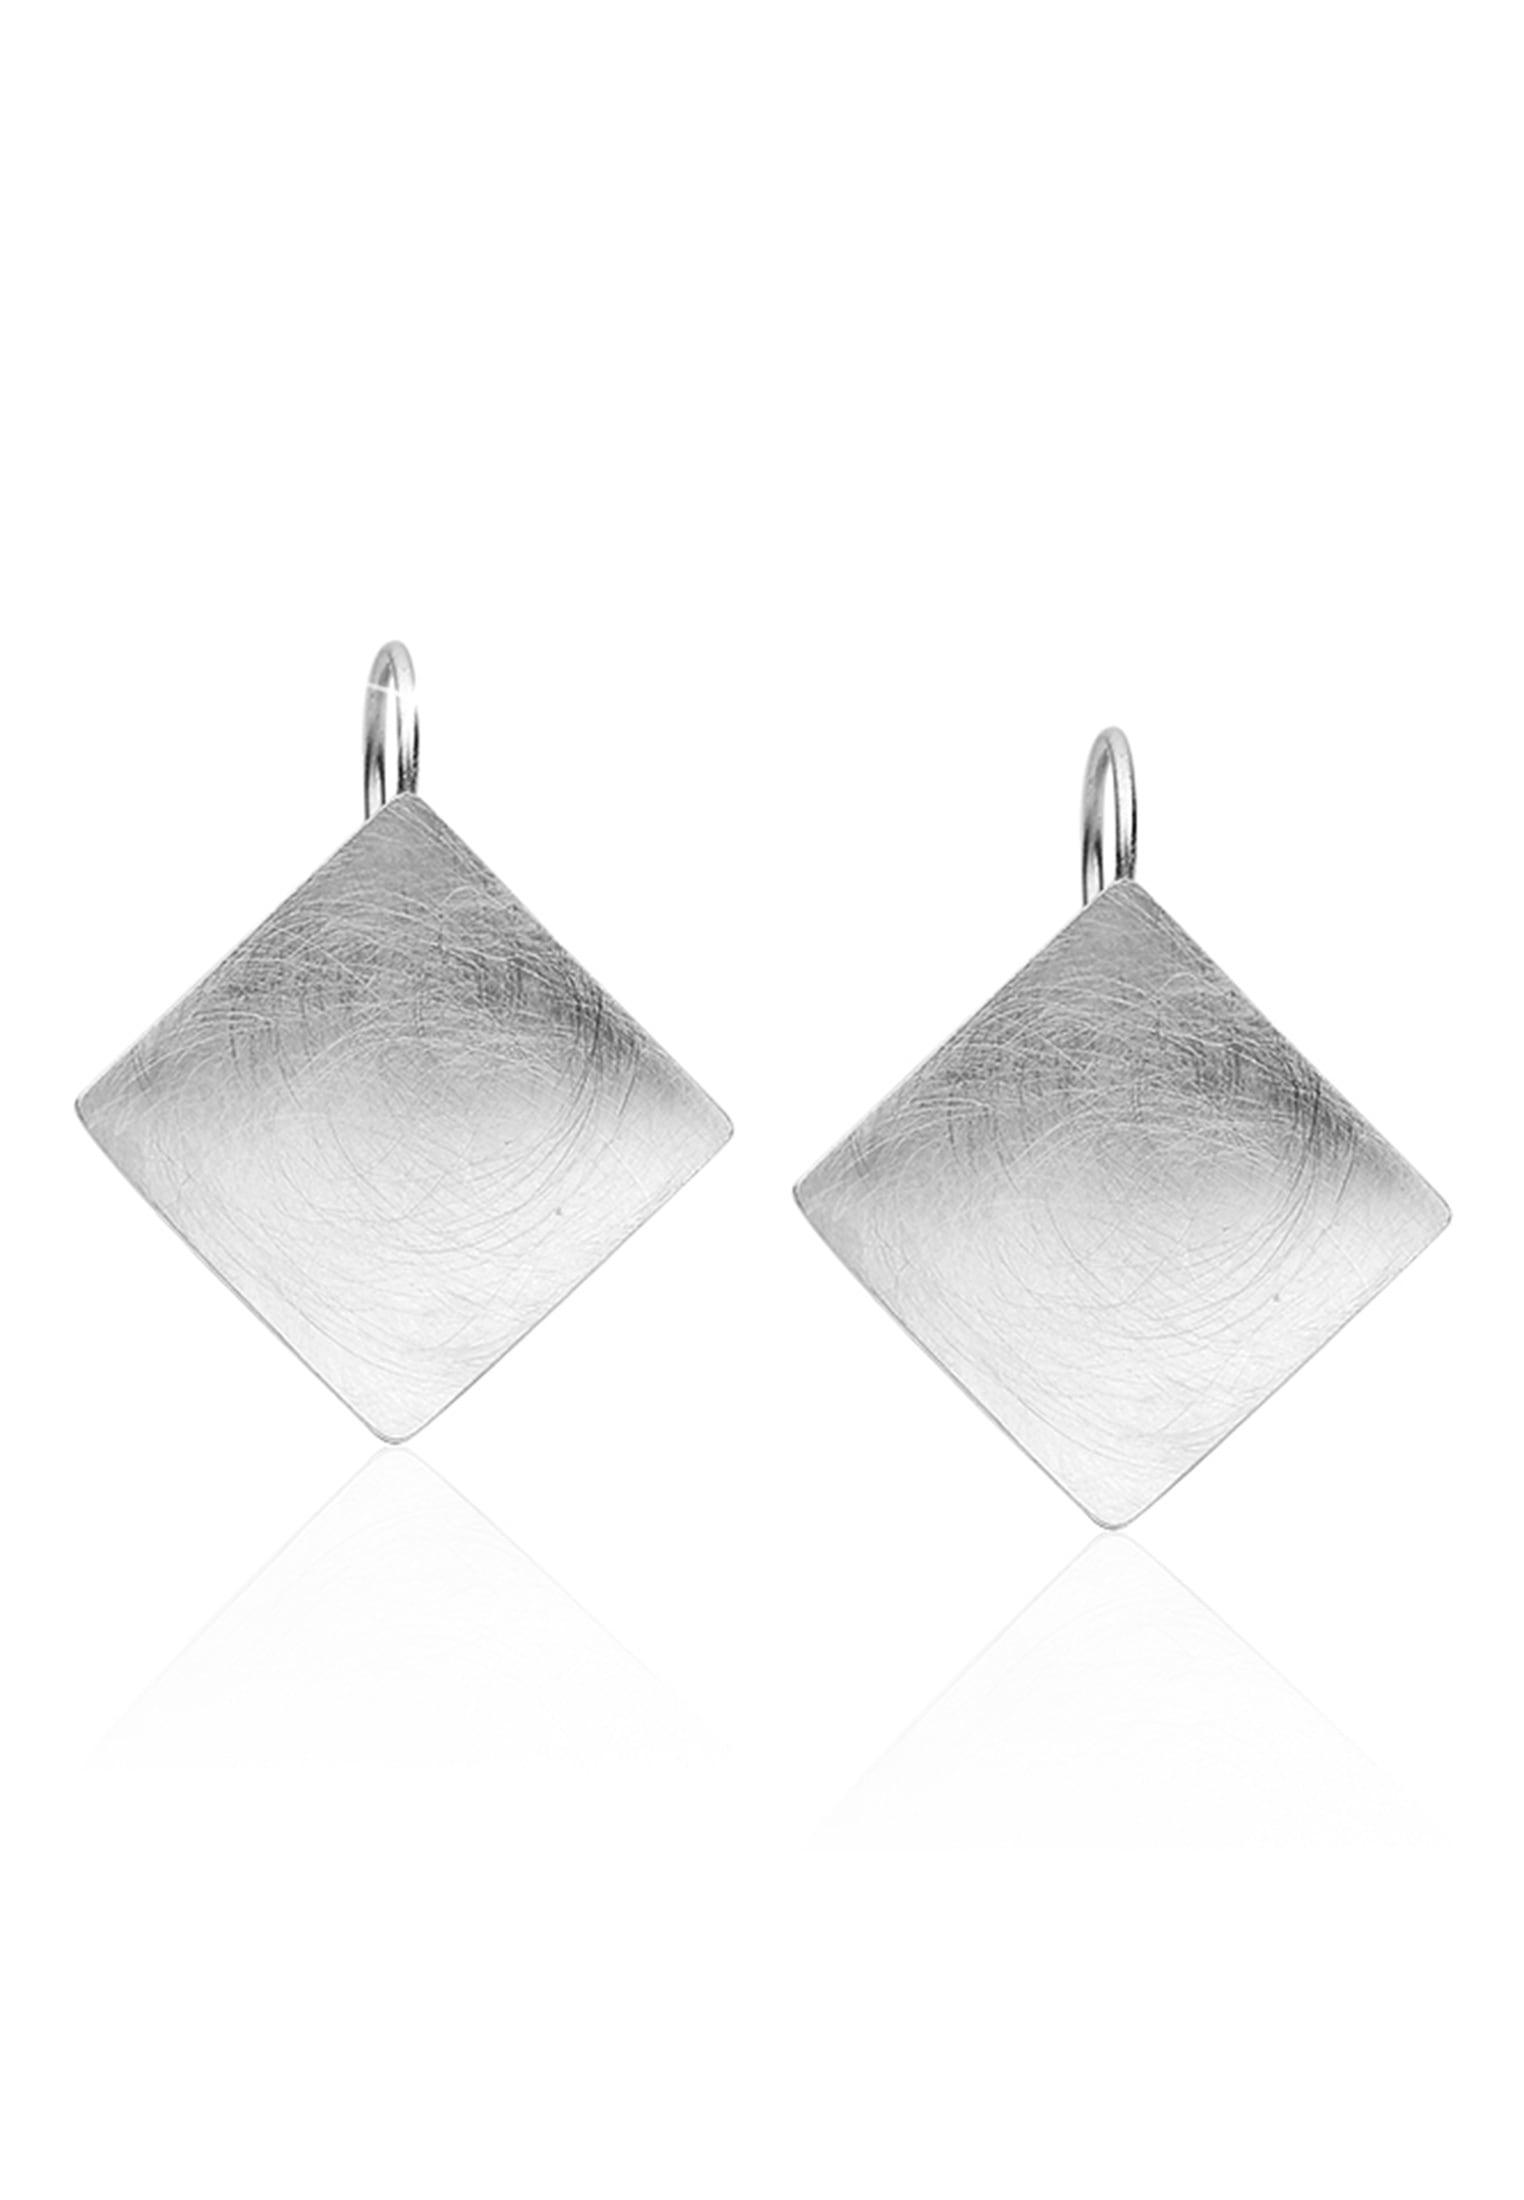 Nenalina Paar Ohrhänger Basic Geo Viereck Brushed Trend 925 Silber